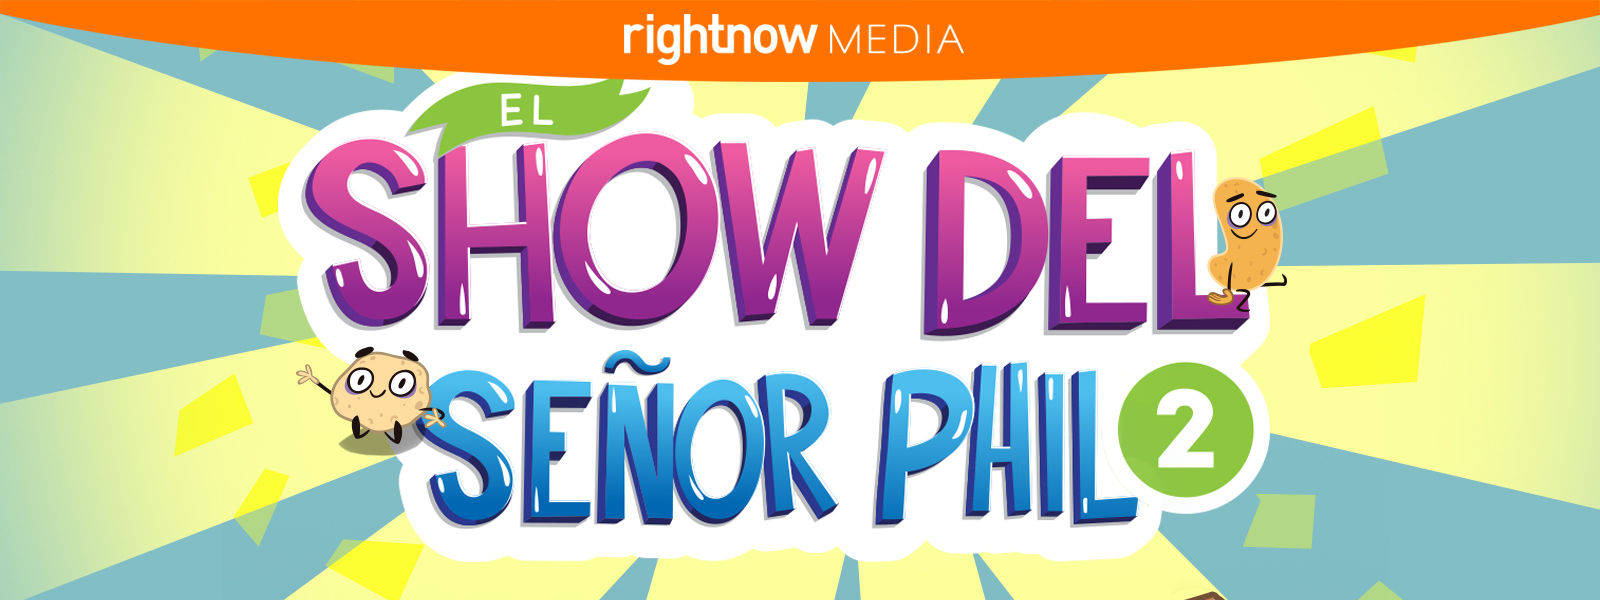 El show del Señor Phil 2